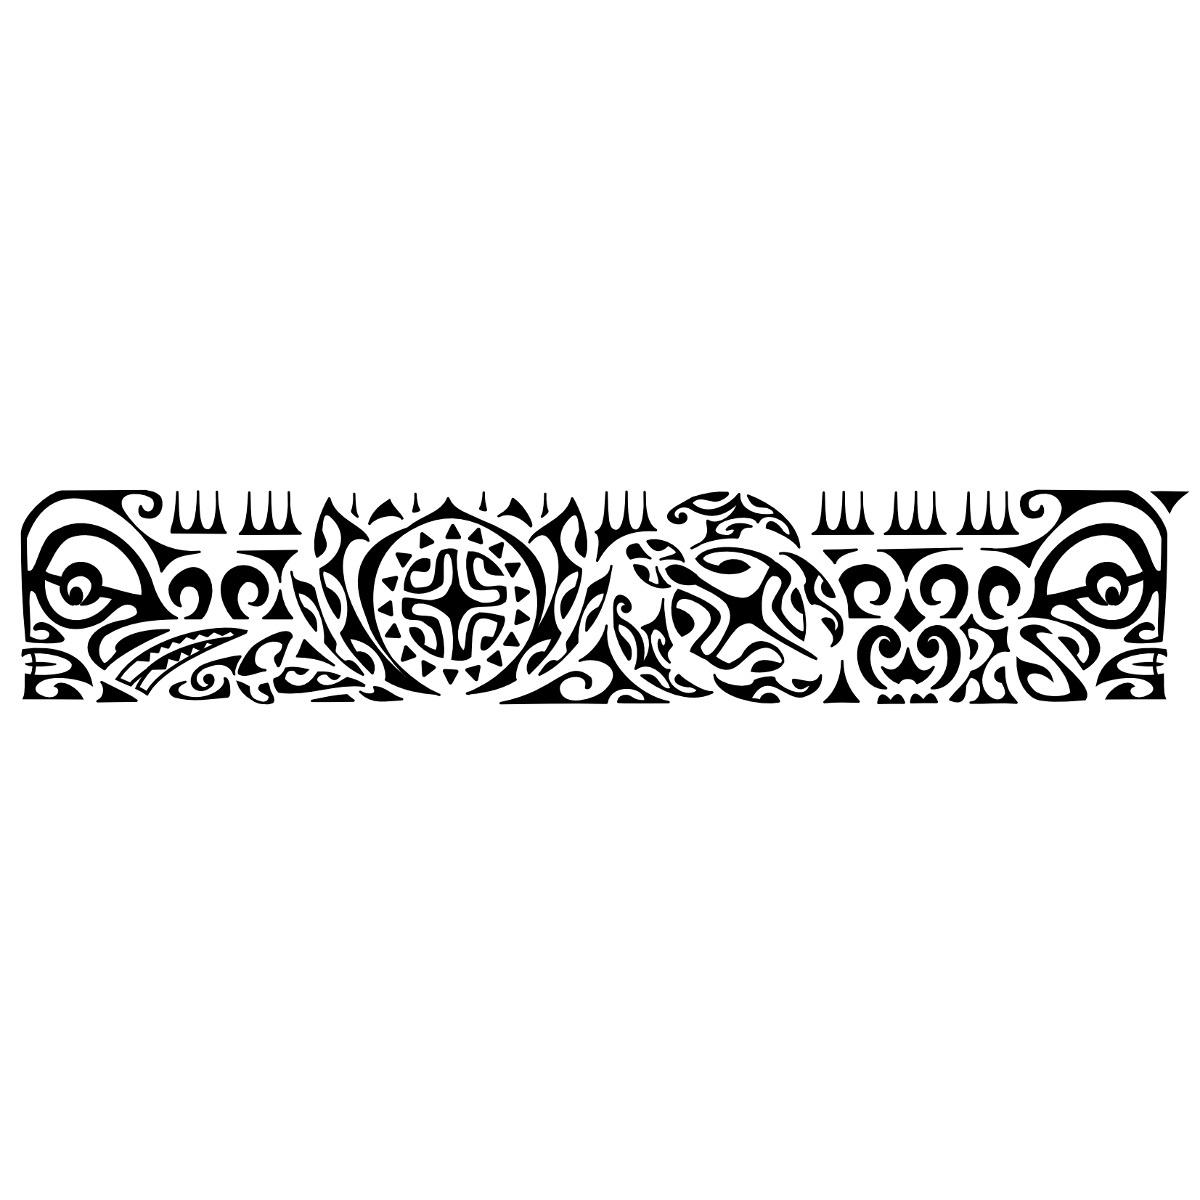 Super Blu Sky Tattoo Studio: Maori Significato 23 WH71